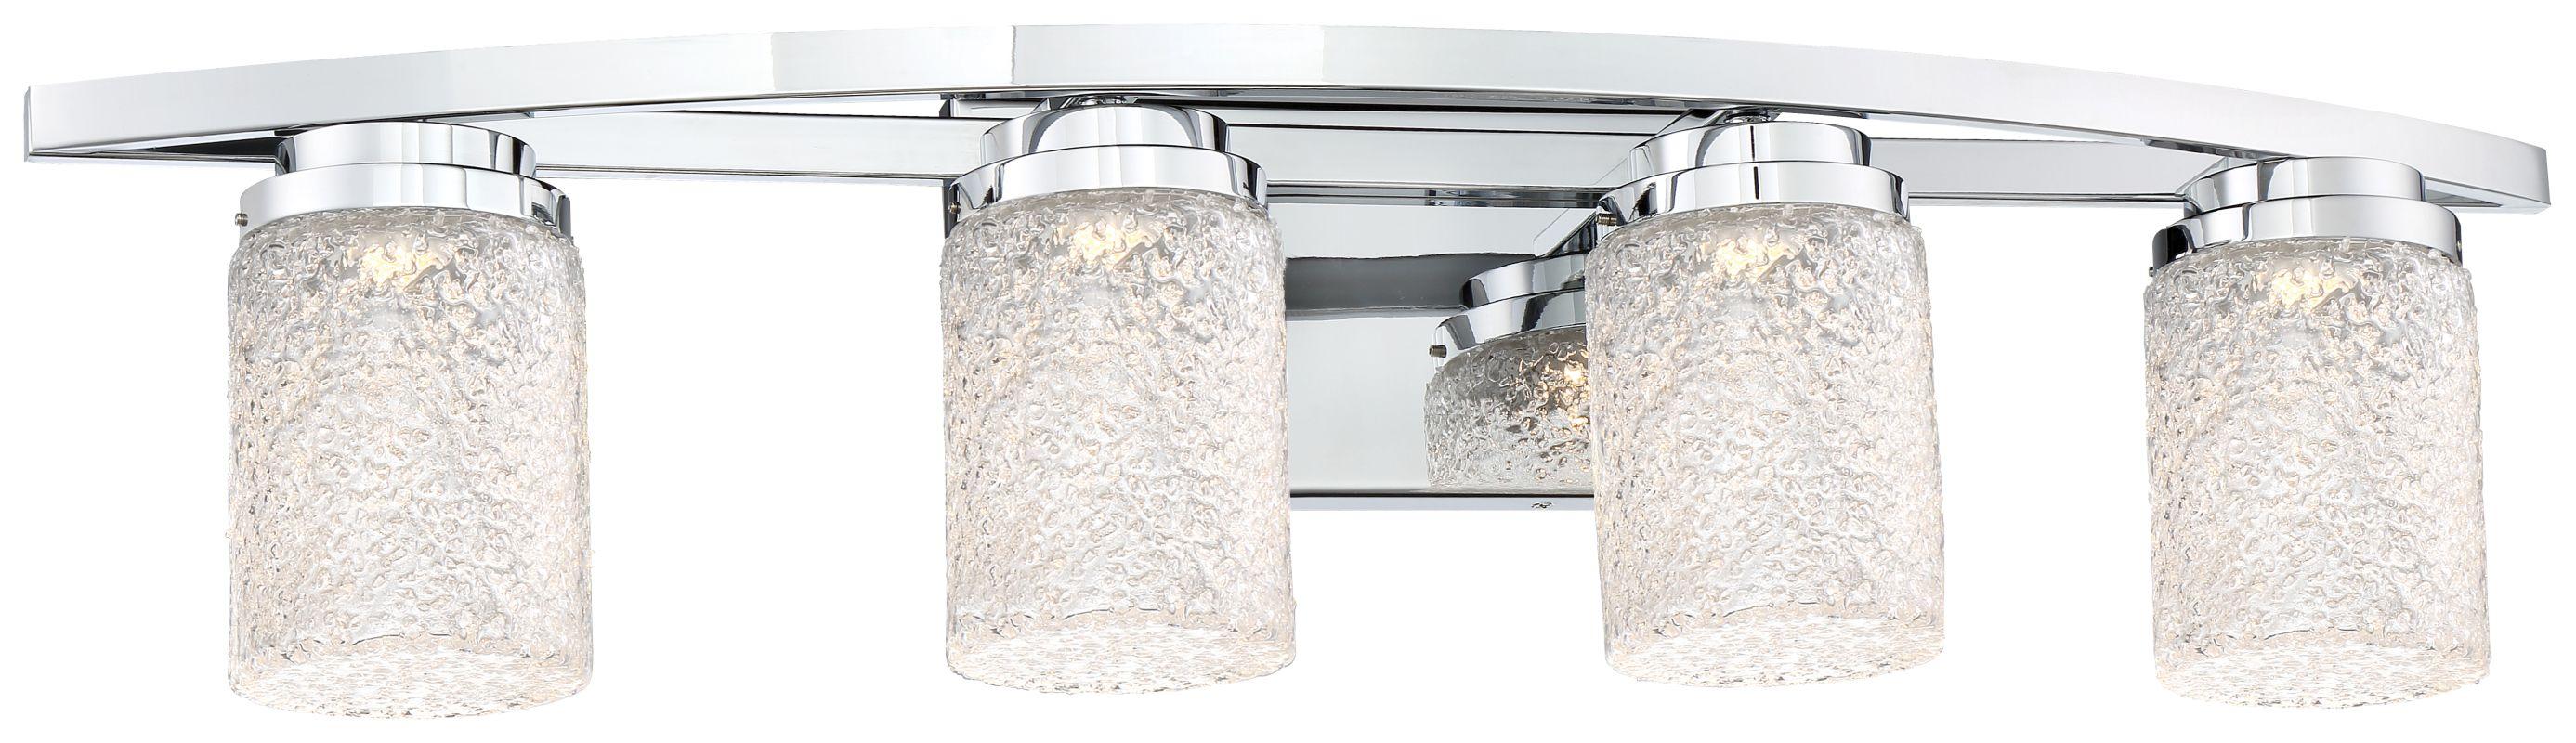 Kovacs P5324-077-L LED Bathroom Vanity Light from the Brilliant